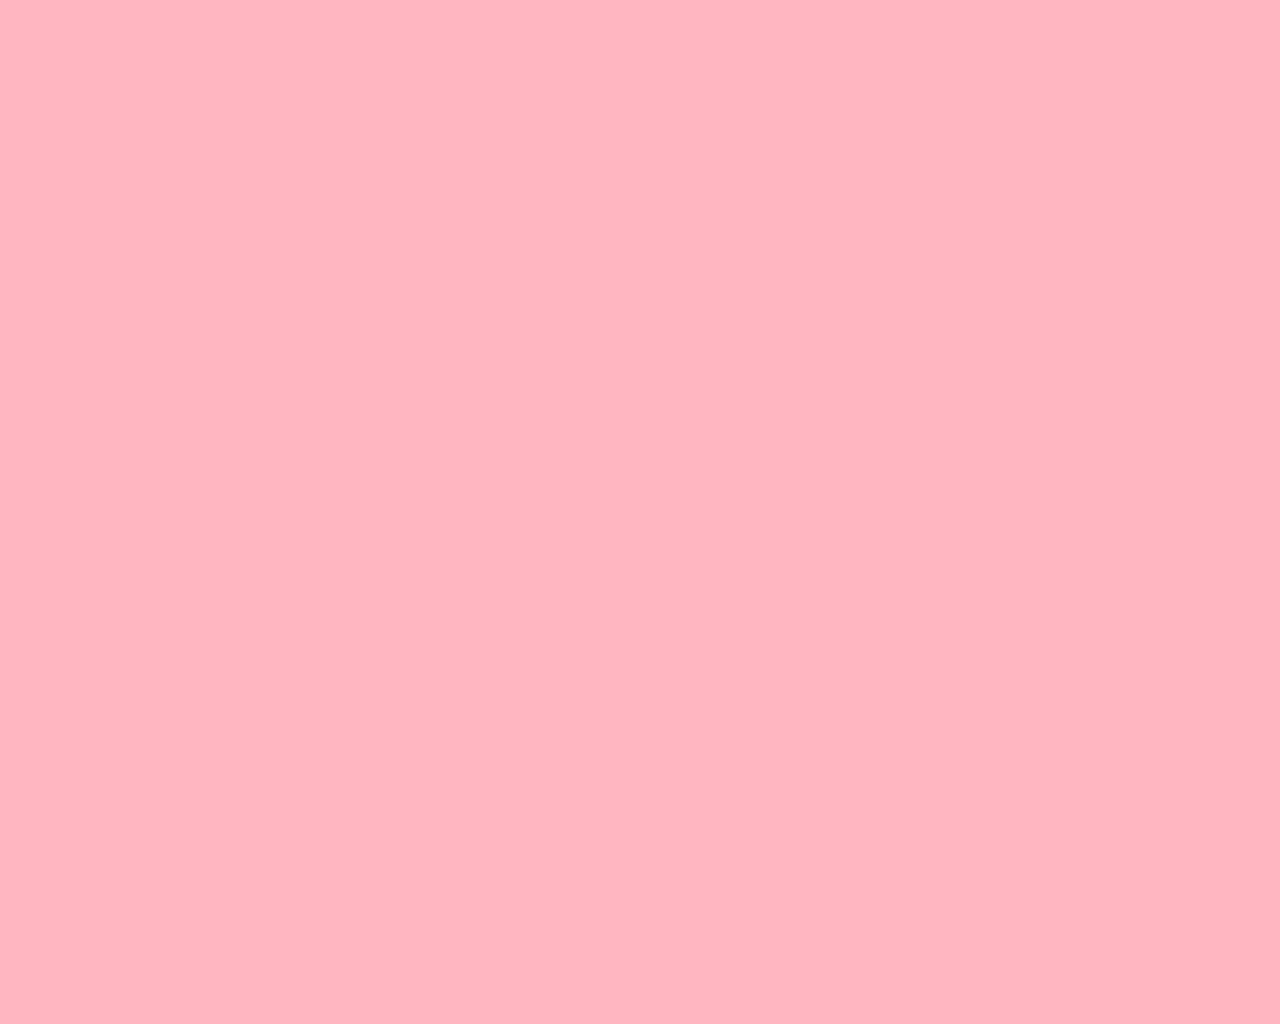 ... floral background download free vector Pink Color Background Wallpaper: wesharepics.info/imagepgkl-pink-color-background-wallpaper.asp